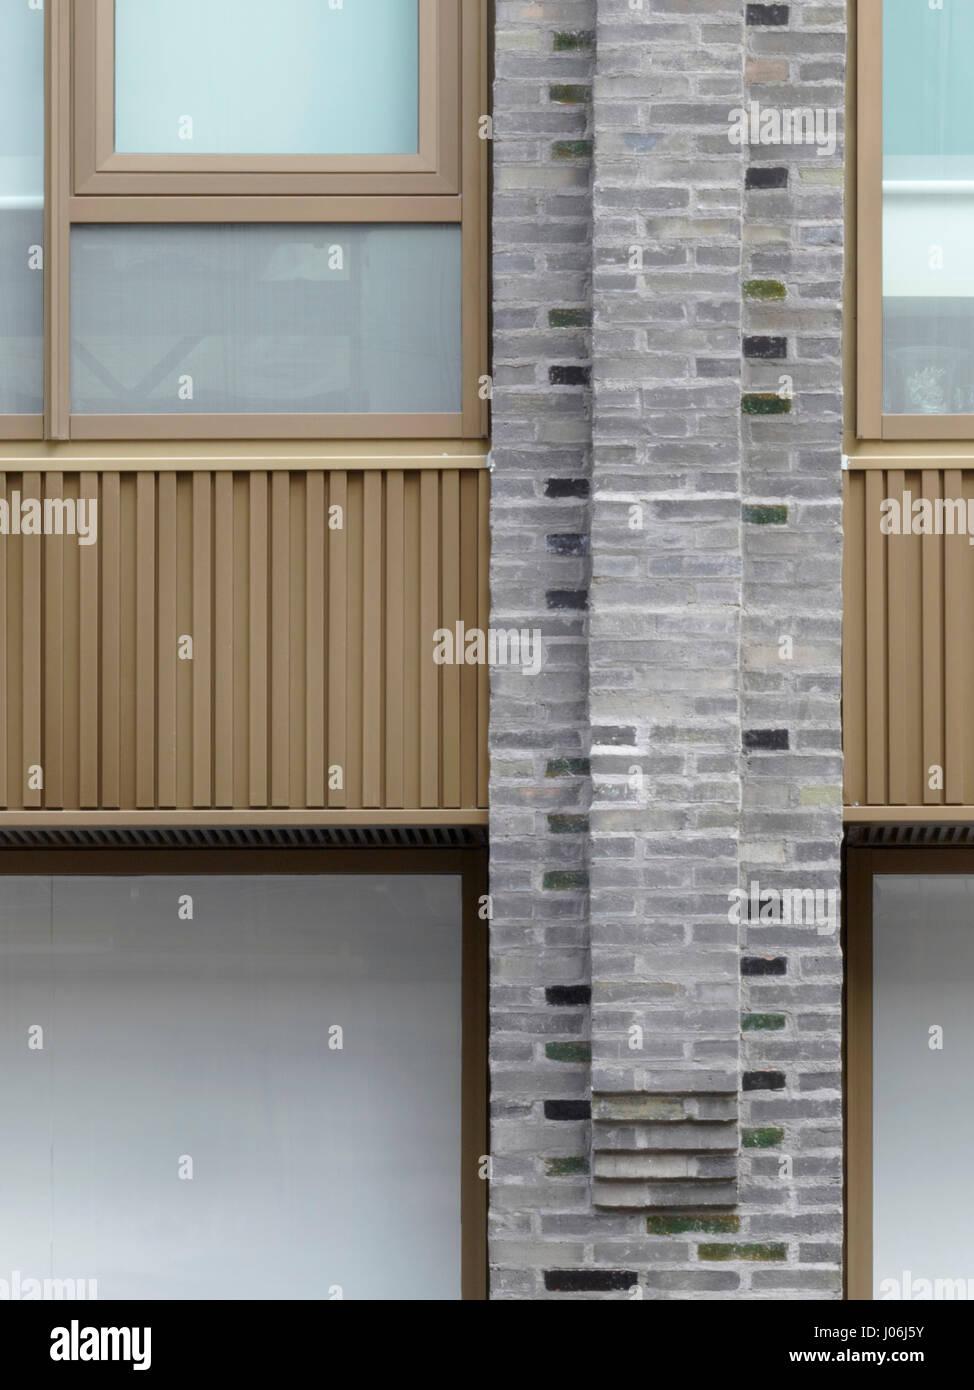 Detail of elevation. 55 Victoria Street, London, United Kingdom. Architect: Stiff + Trevillion Architects, 2016. - Stock Image